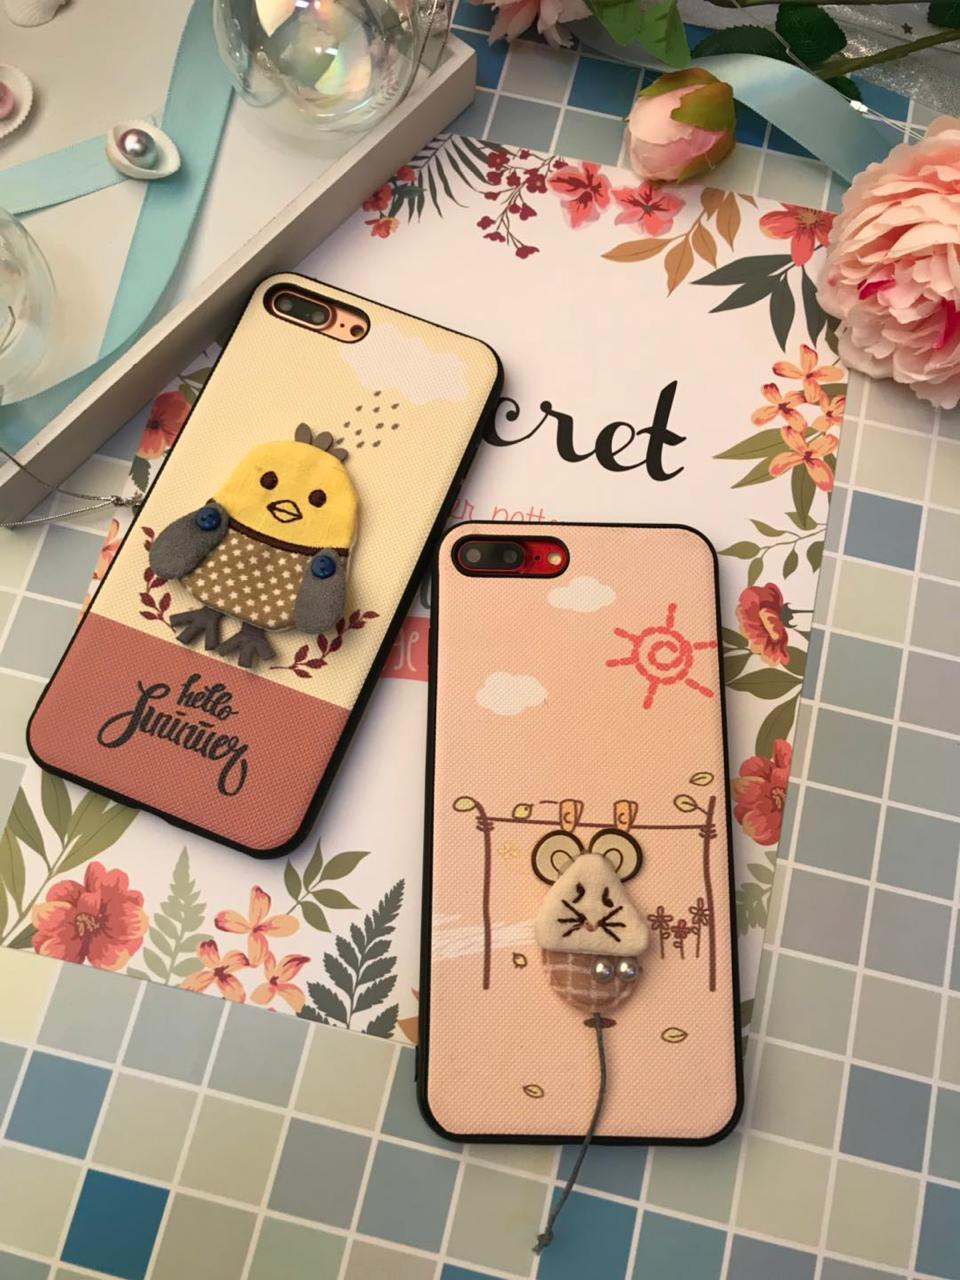 Case 4D Boneka Happy Morry For Vivo Y71 / Case Karakter / Case Happy Morry / Case 4D Boneka Lucu - Motif Random